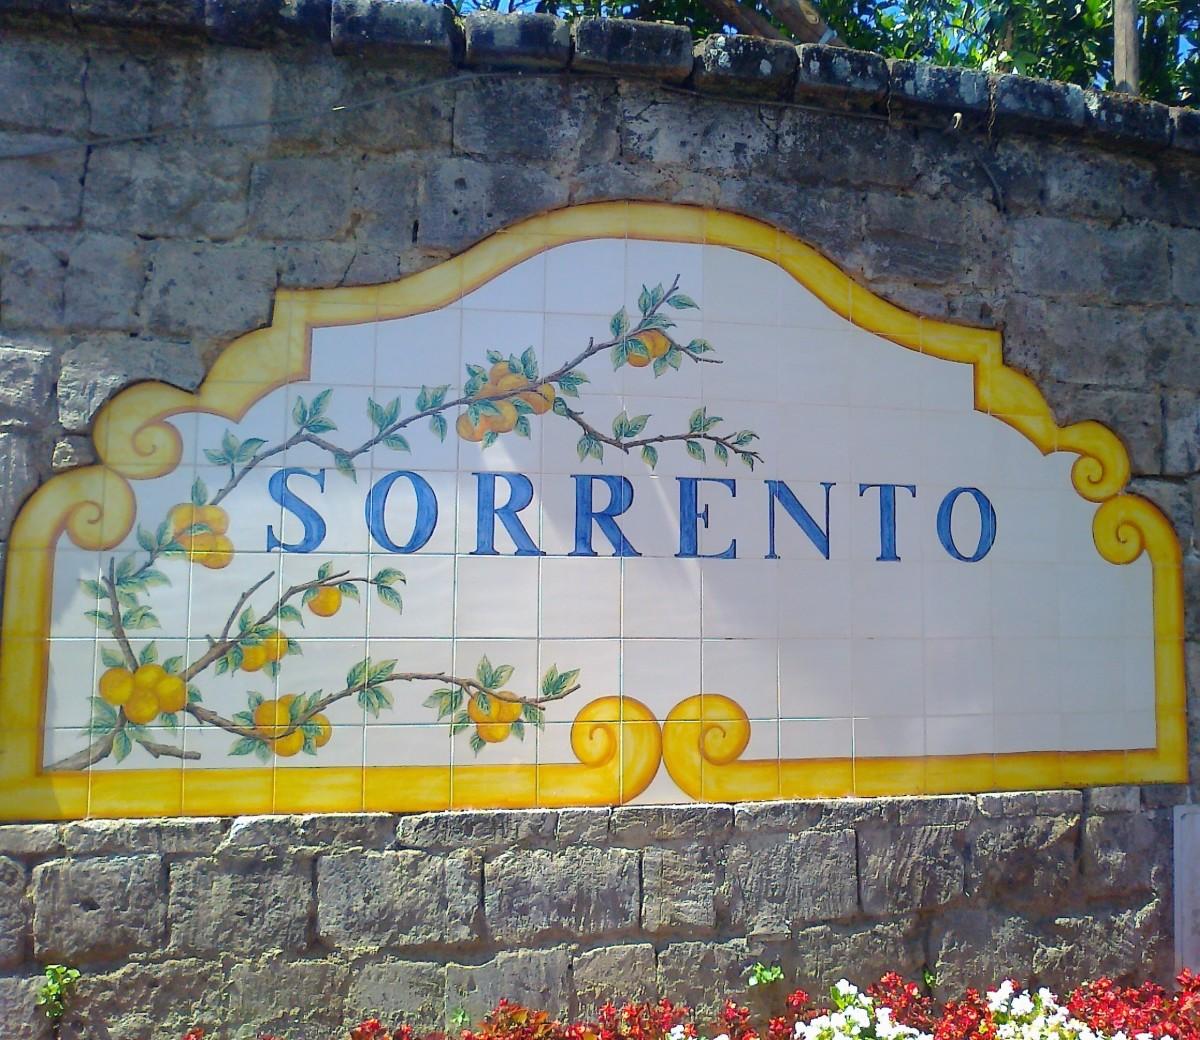 The lemon border hints at one of Sorrento's most notable achievements, Limoncello